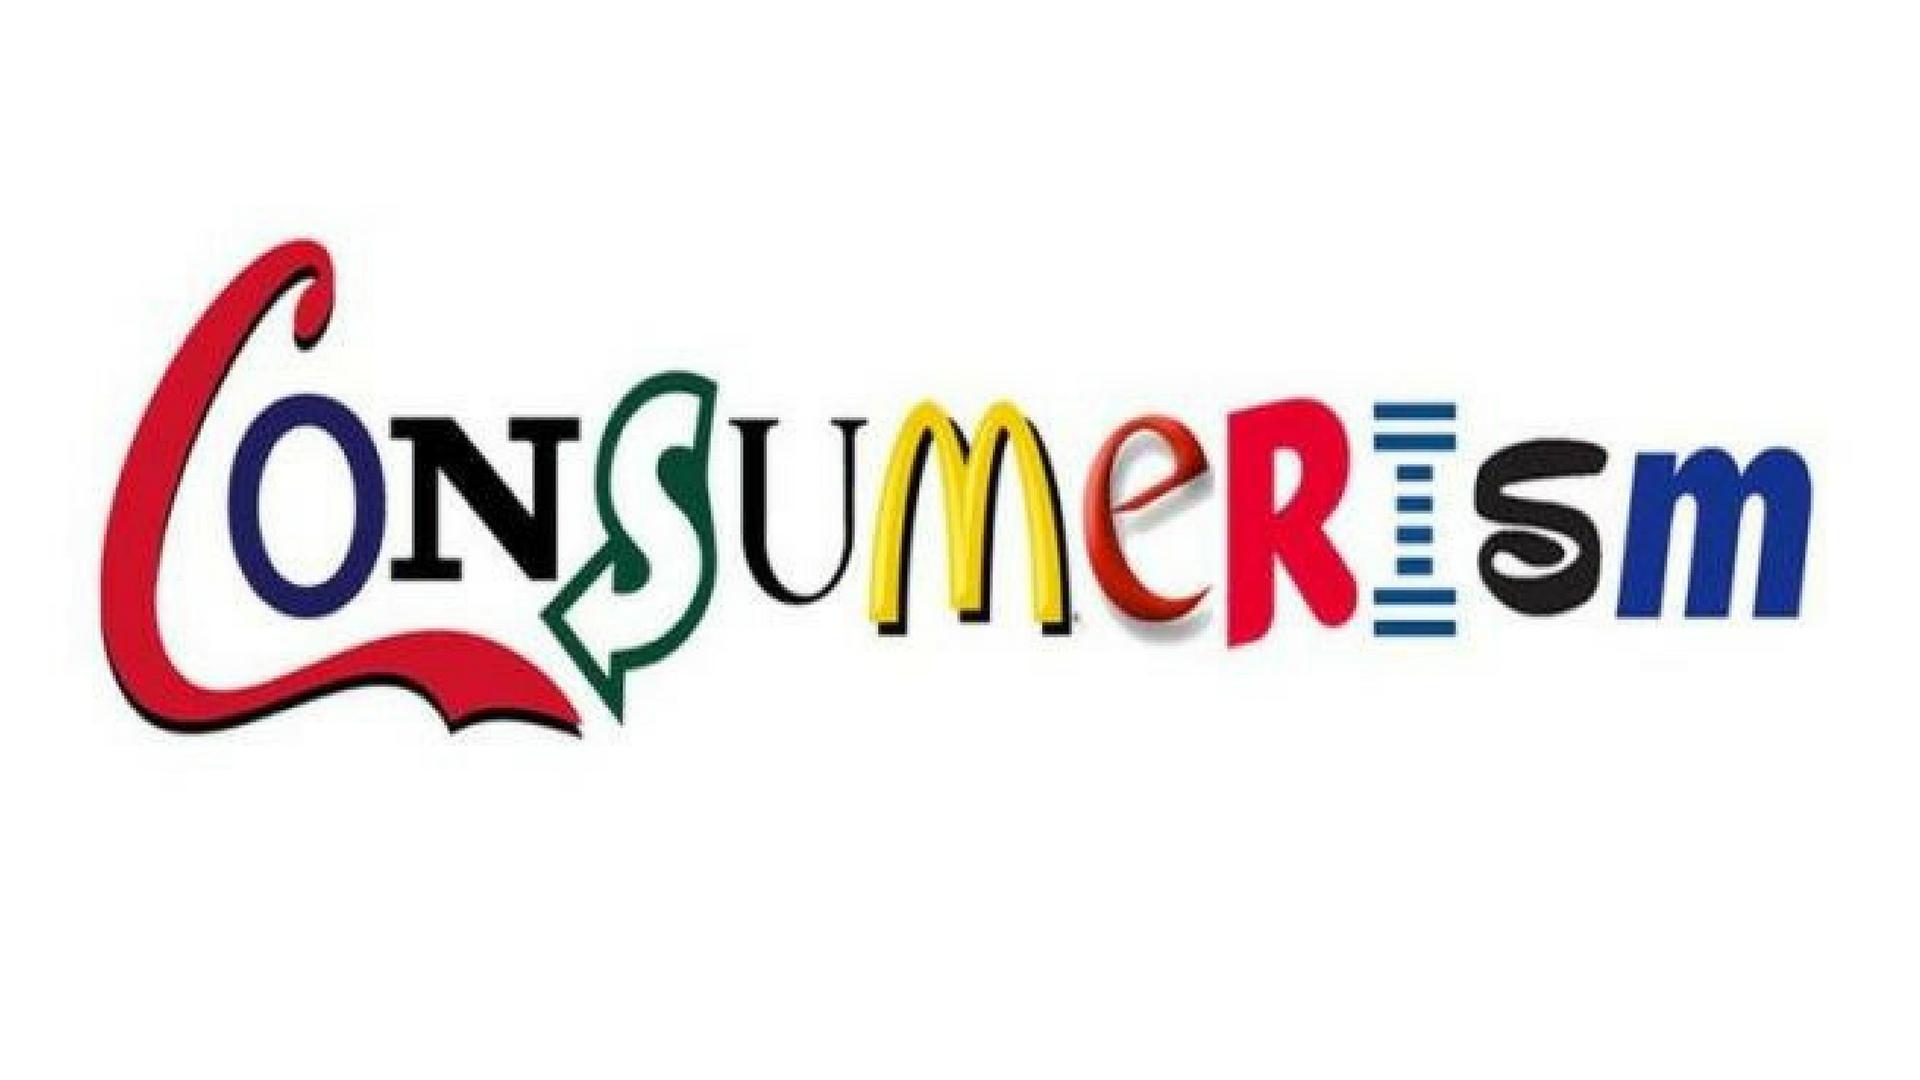 EM_Consumerism25.png